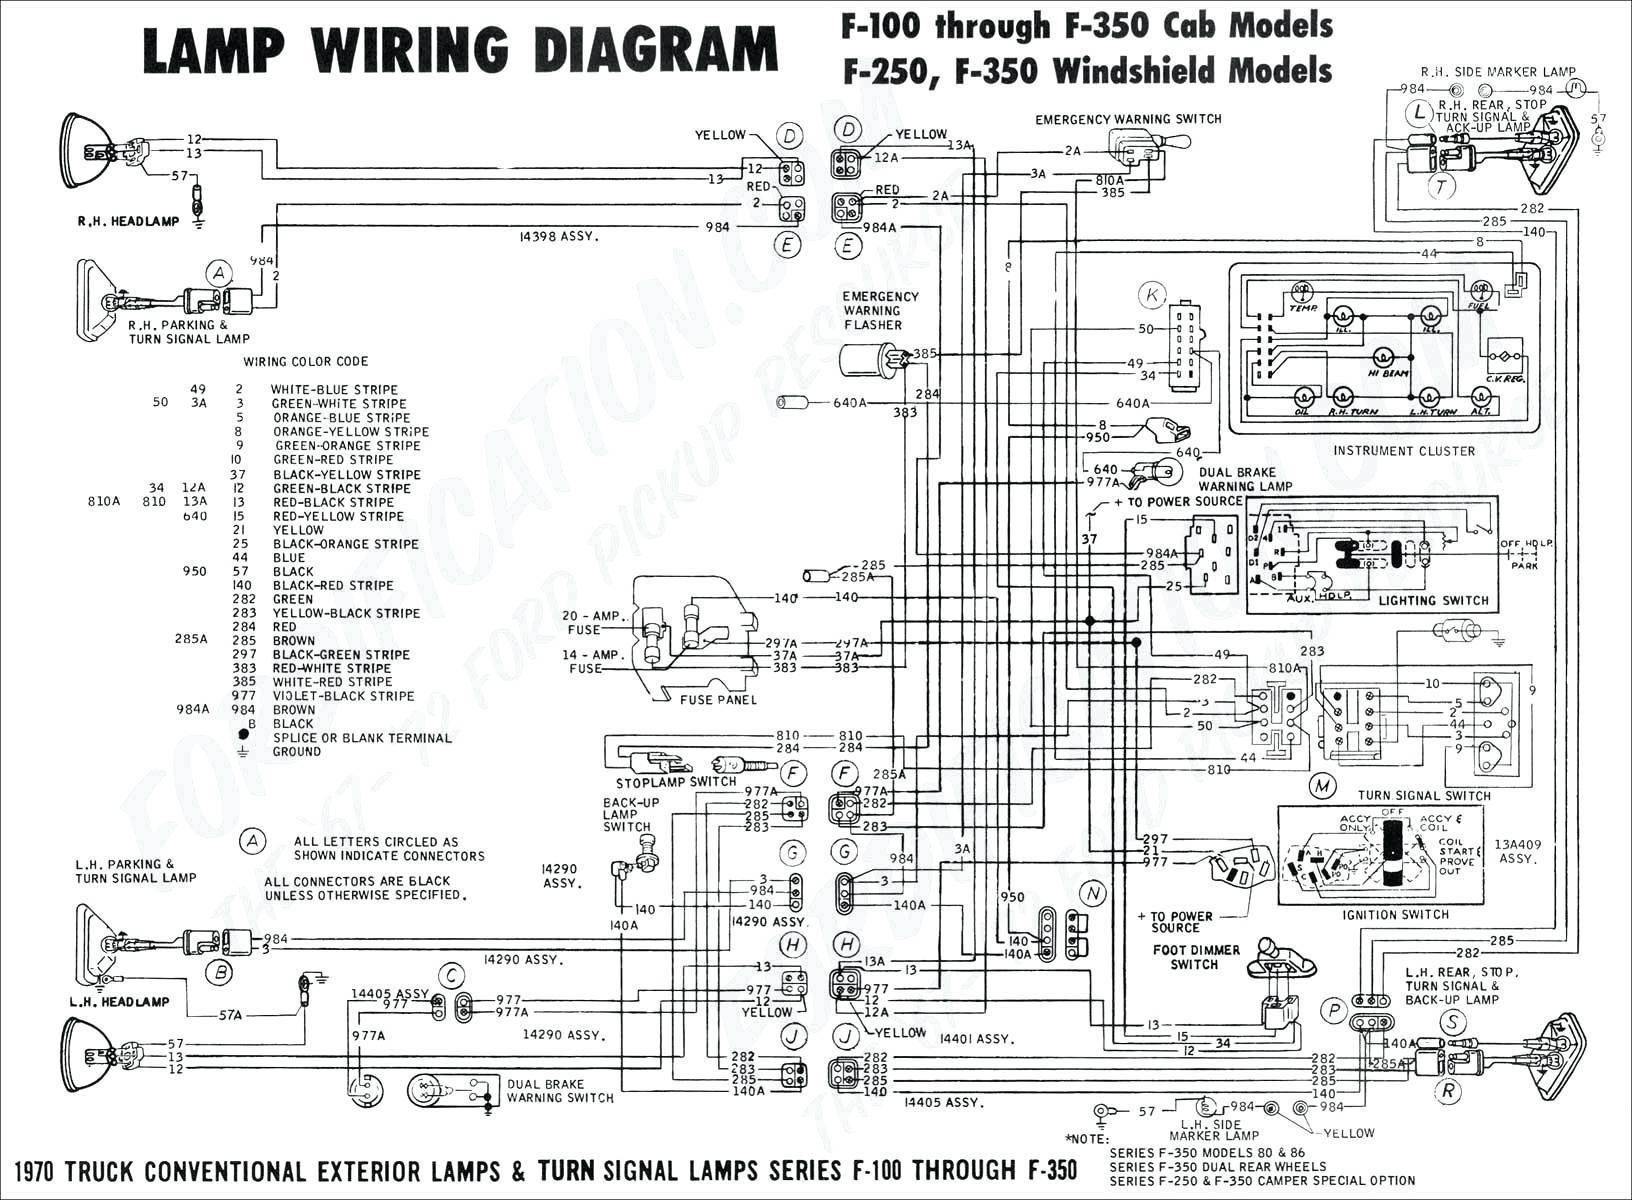 1996 toyota tercel engine diagram 96 monte carlo wiring diagram worksheet and wiring diagram e280a2 of 1996 toyota tercel engine diagram